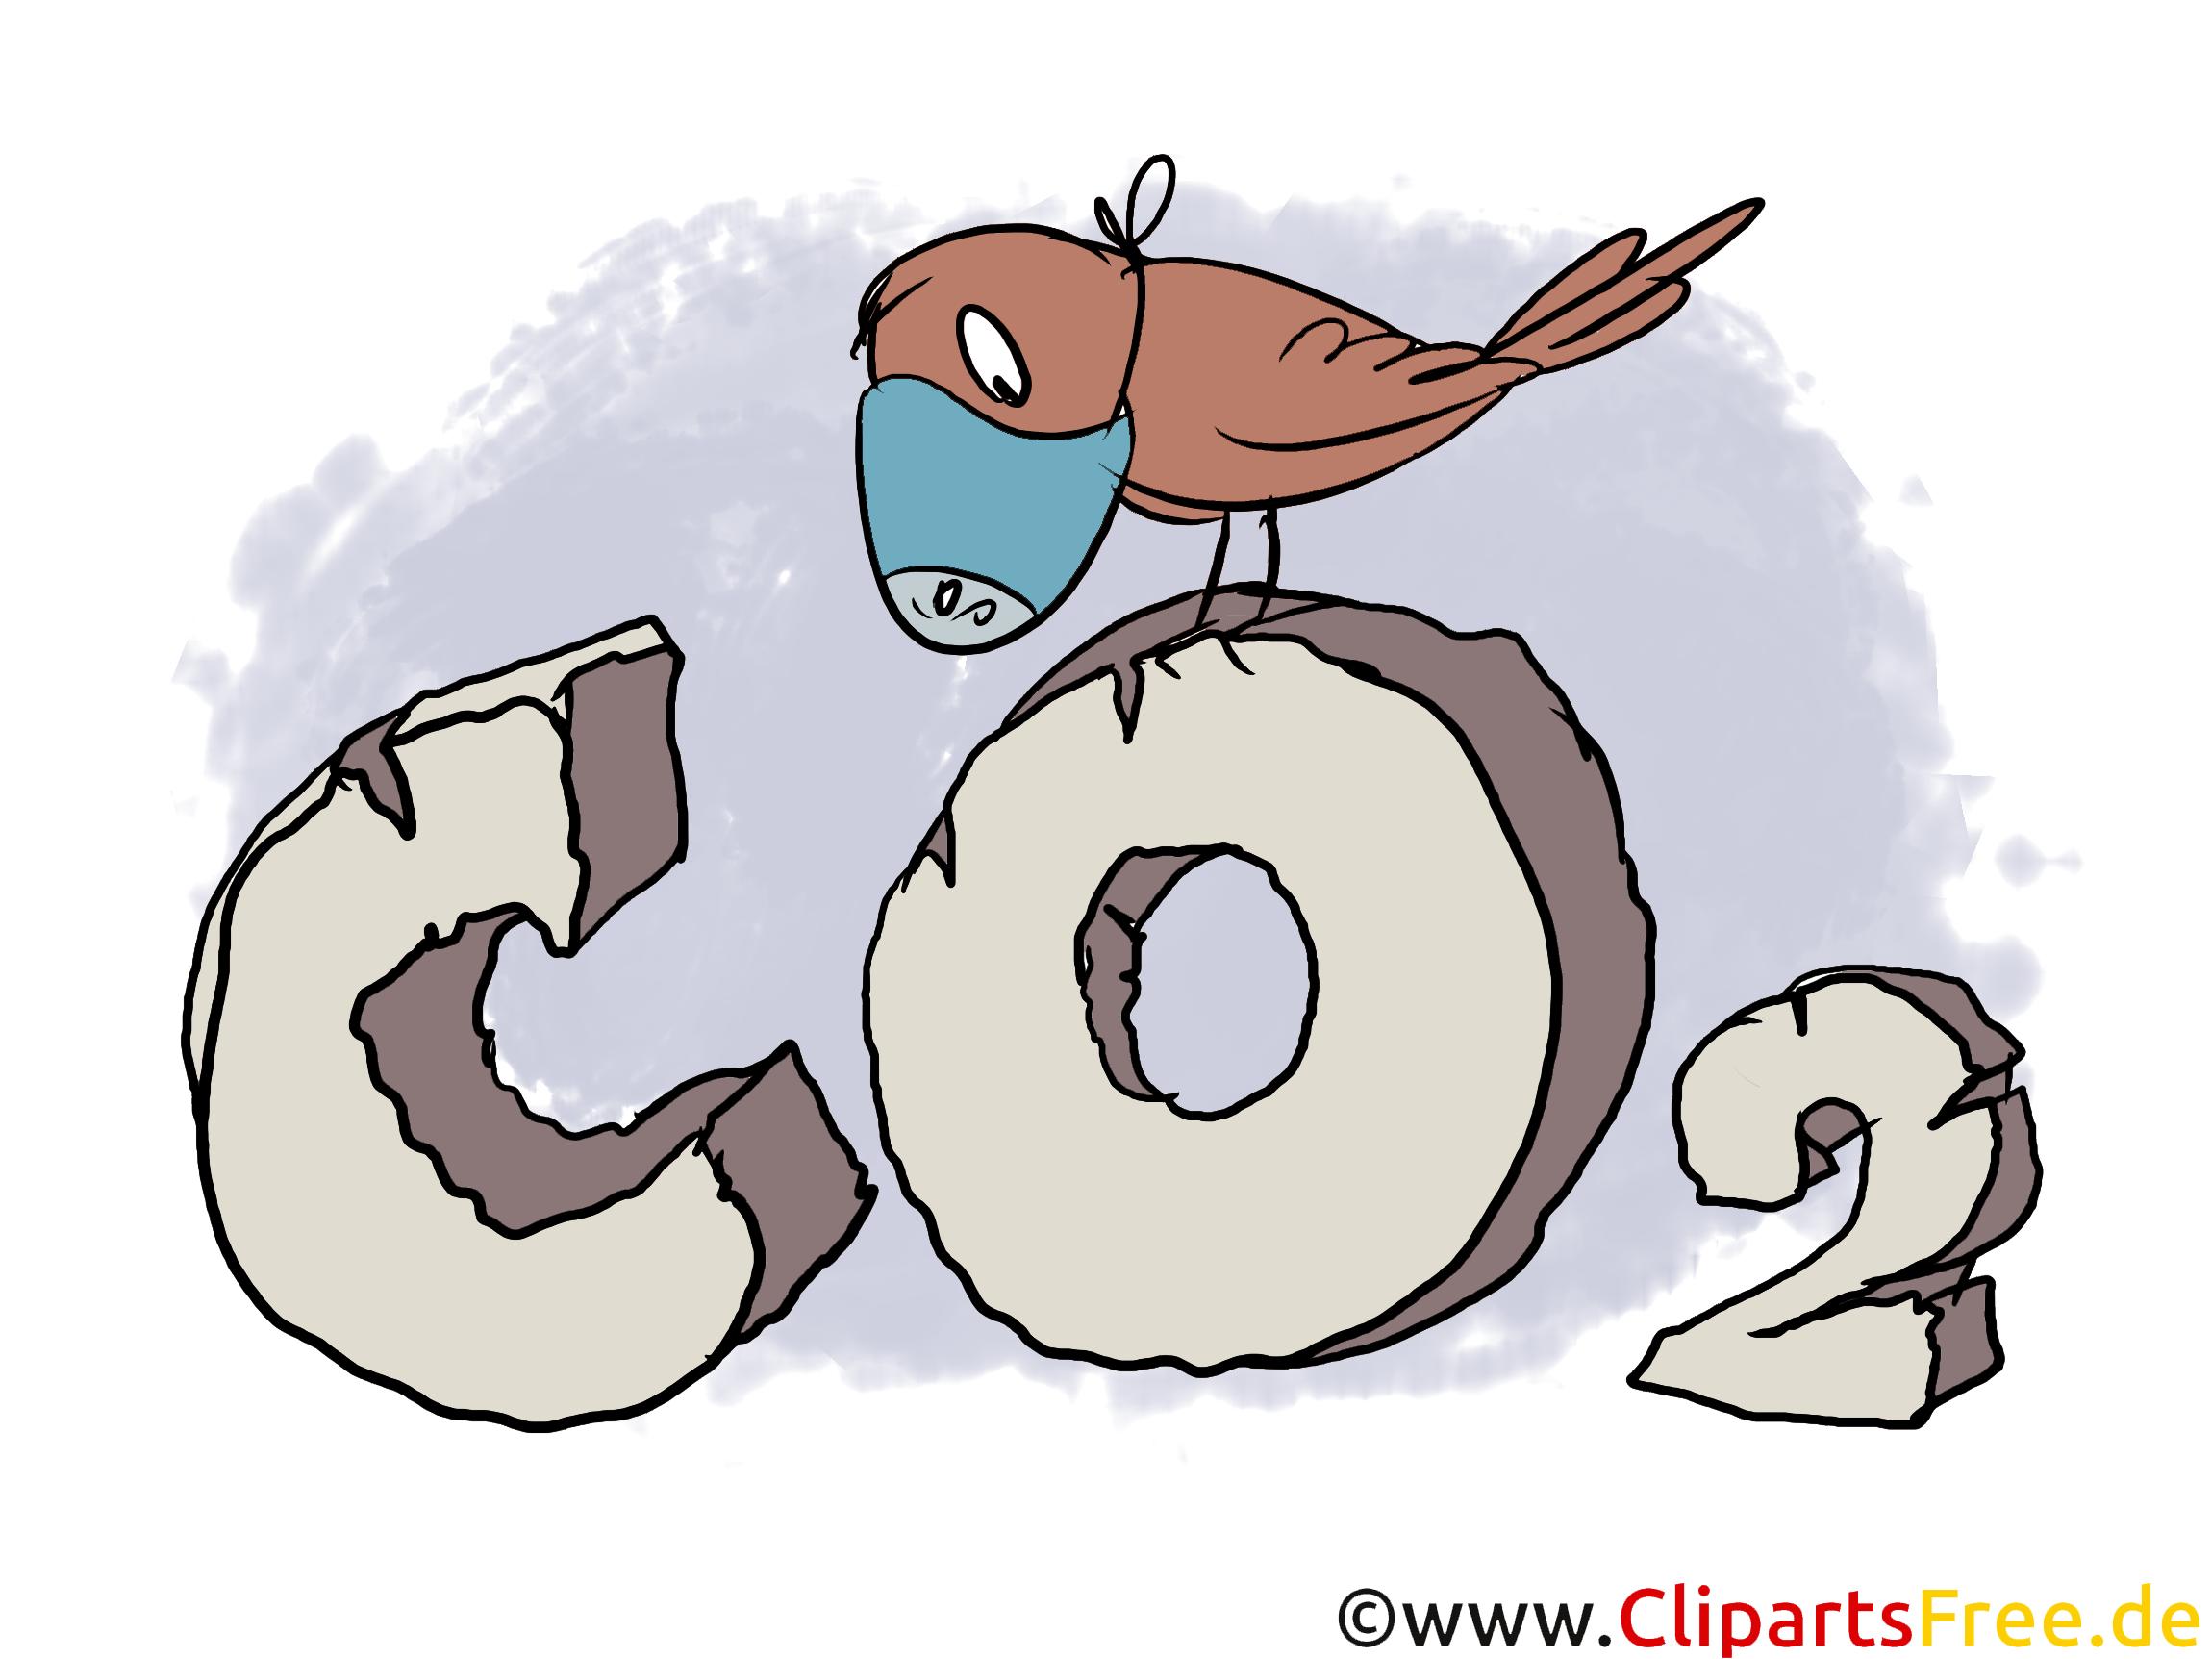 Co2 Illustration, Clipart, Stock Bild kostenlos